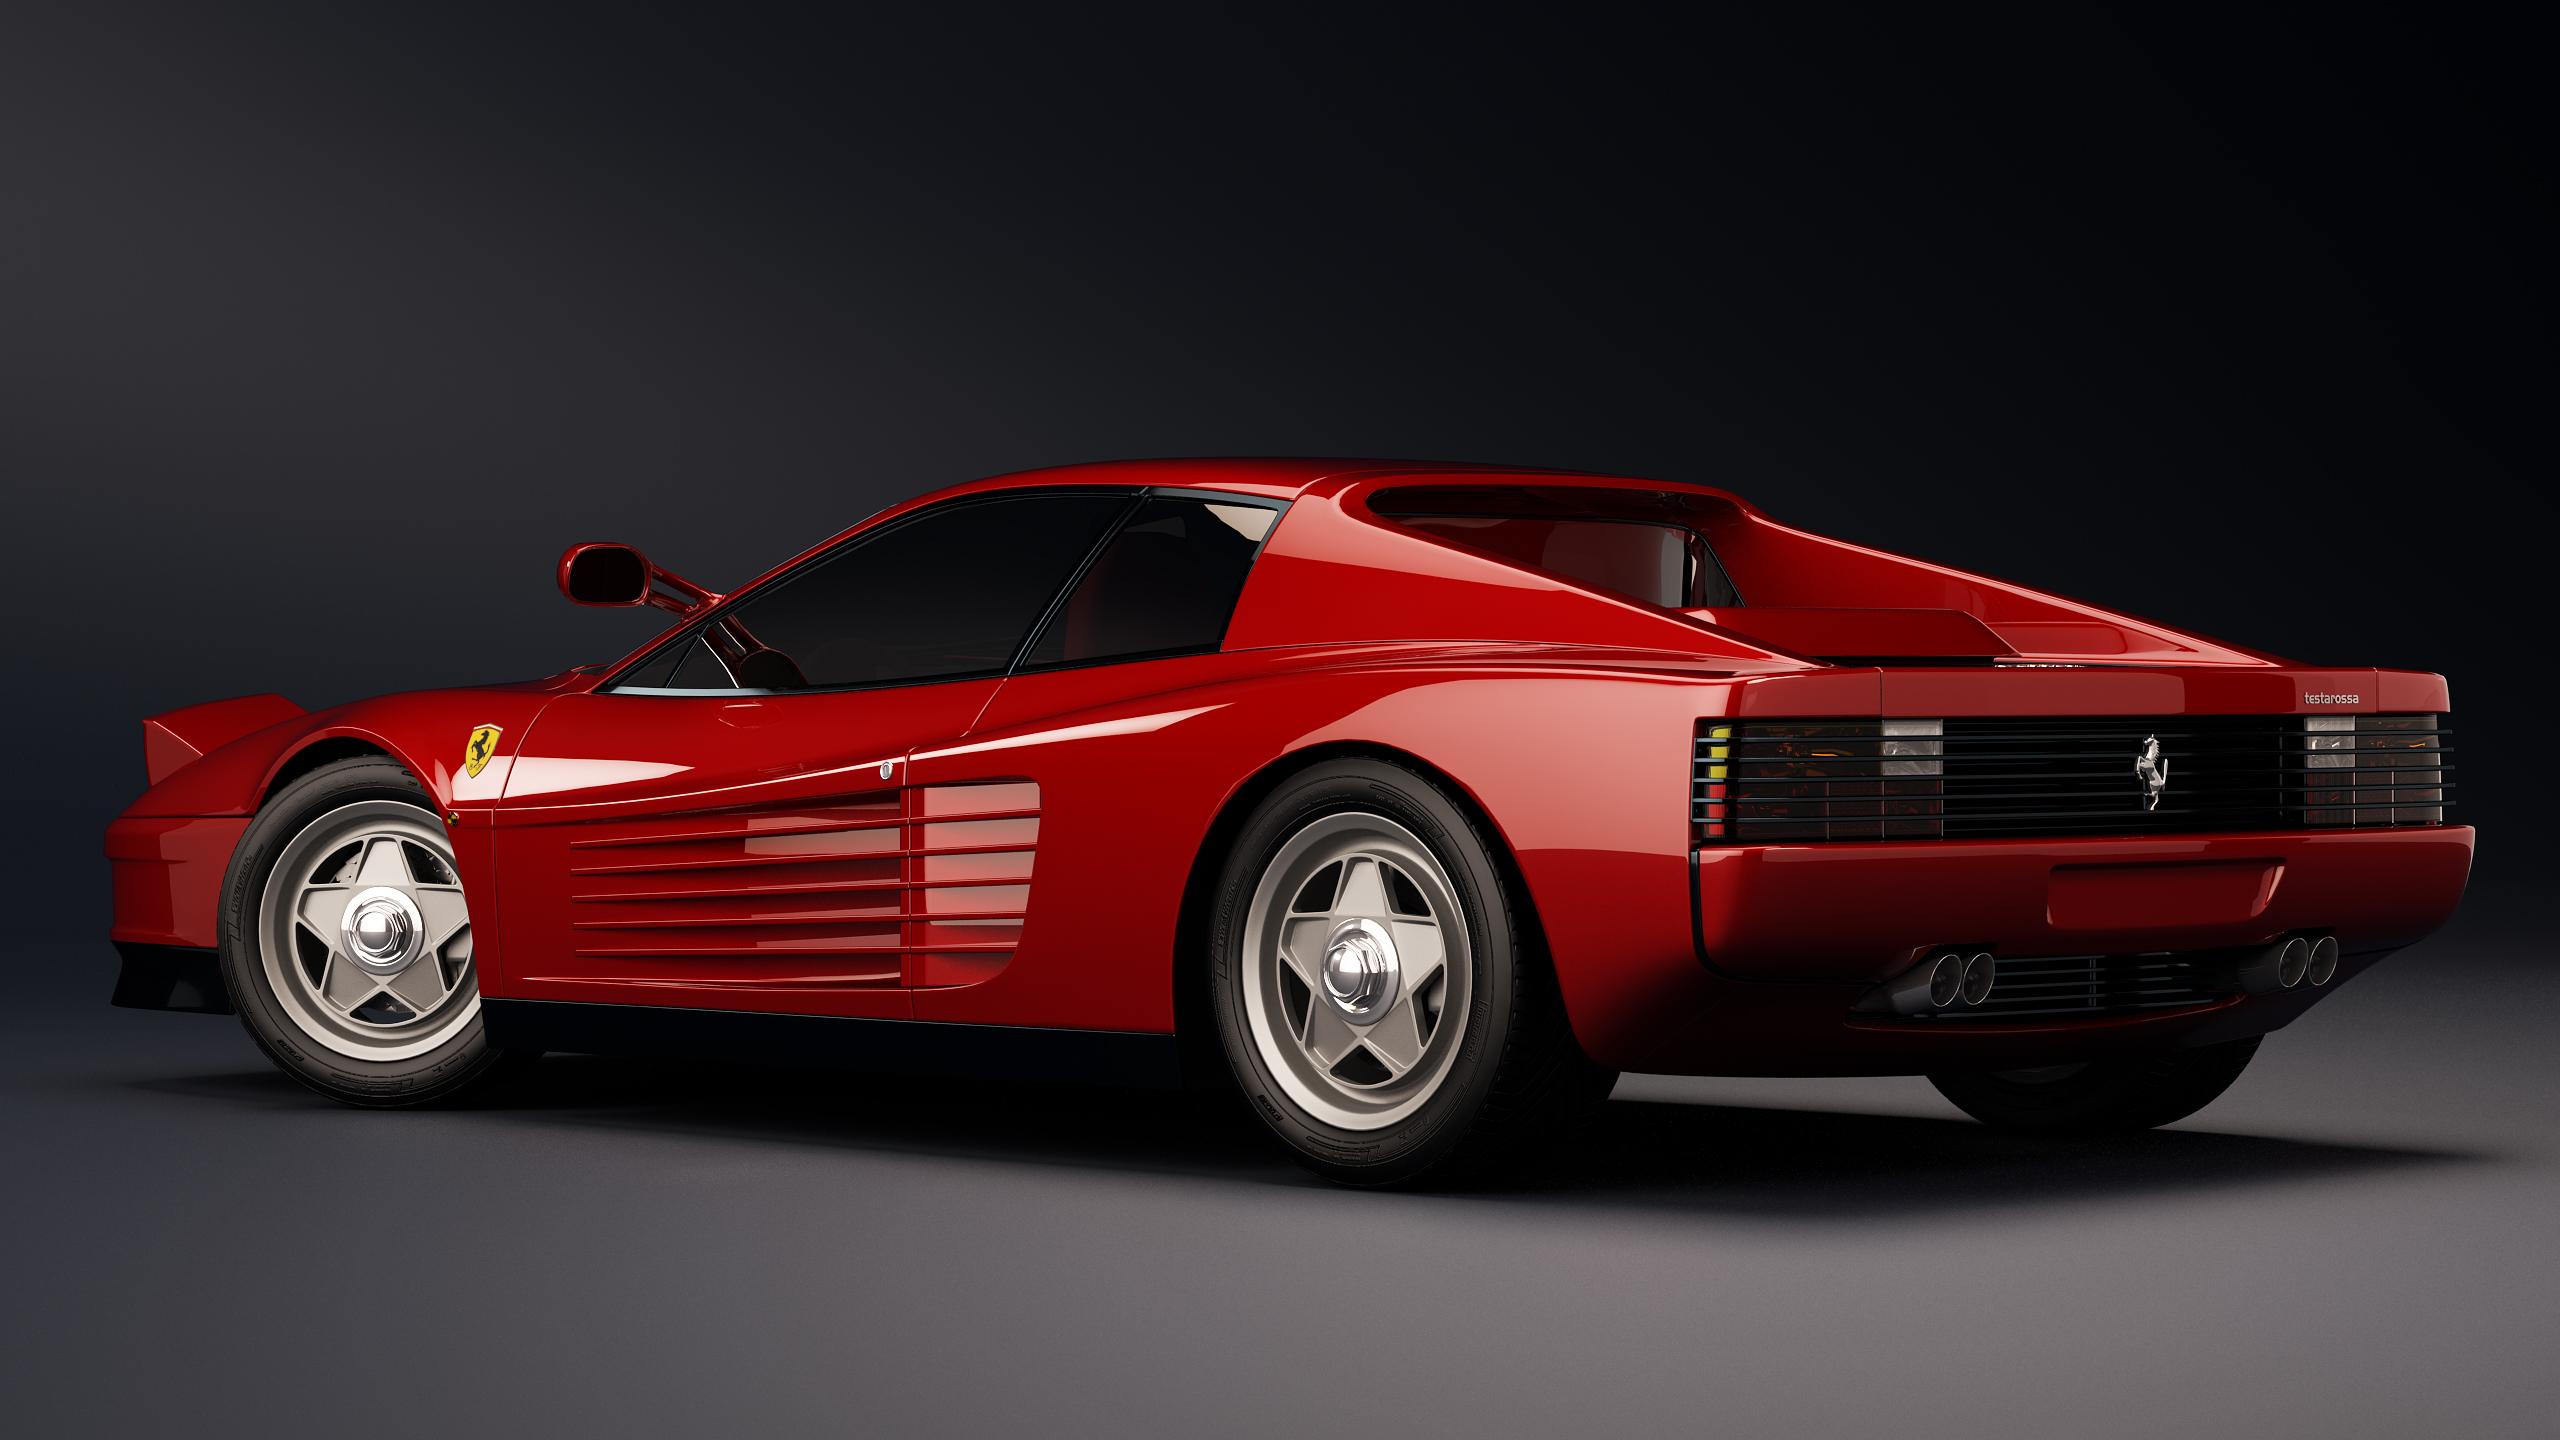 1986 Ferrari Testarossa F110 By Nancorocks On Deviantart